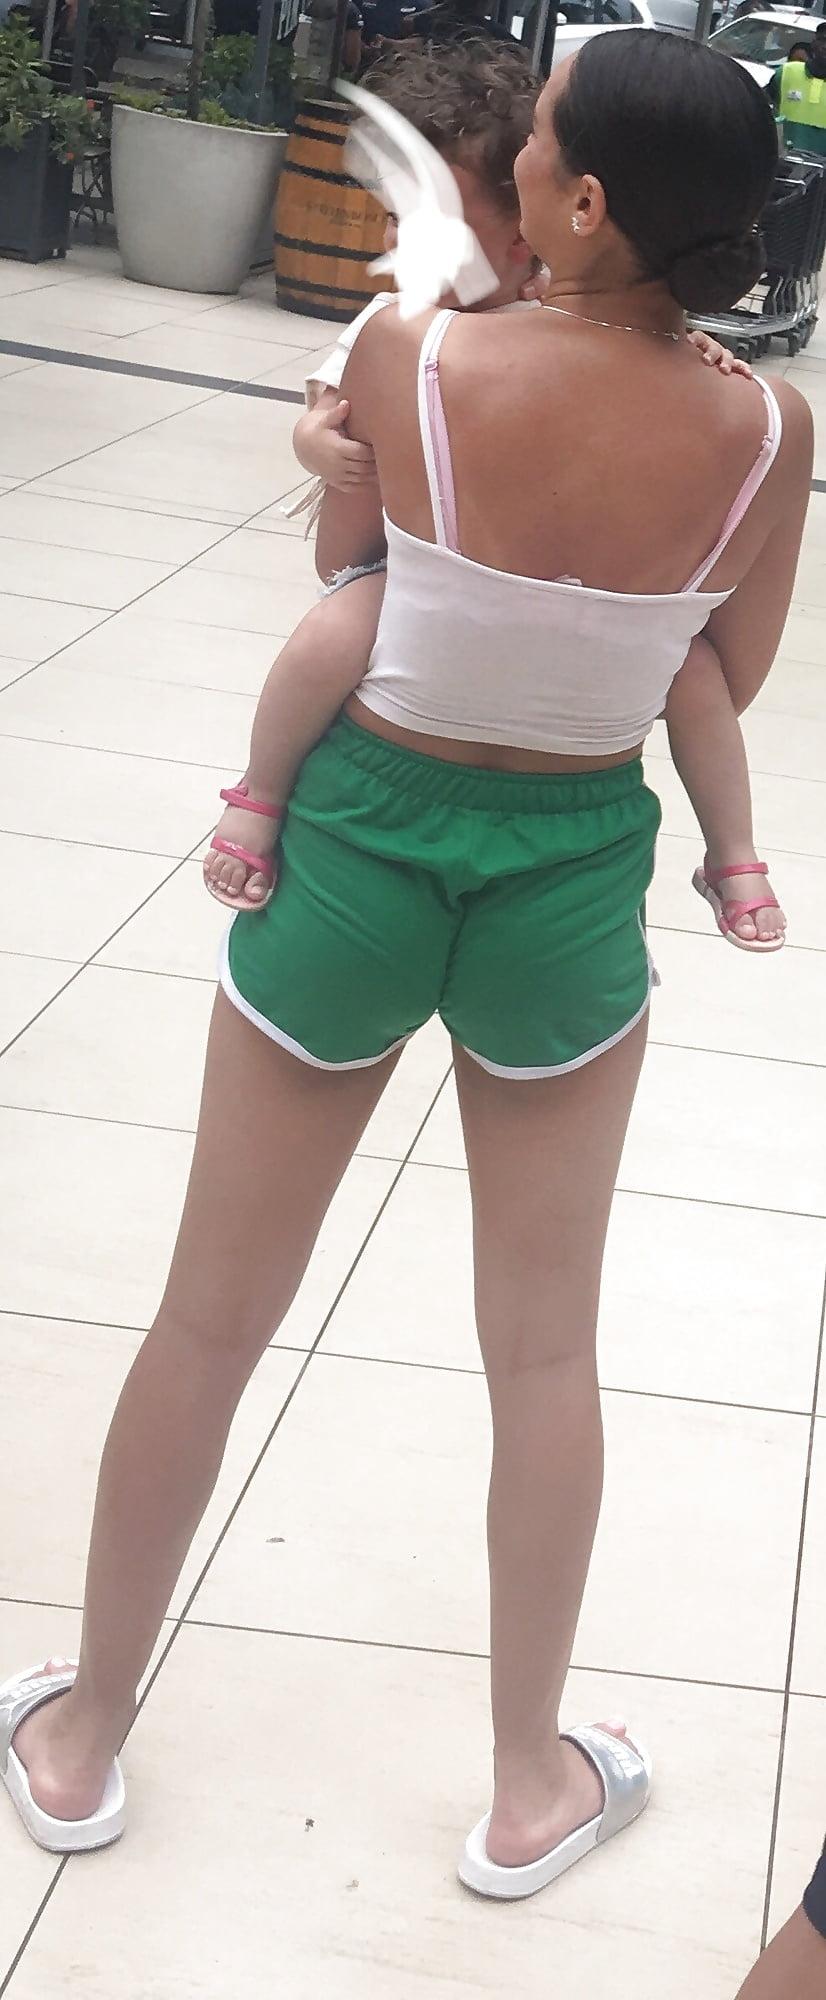 Teen in tight shorts